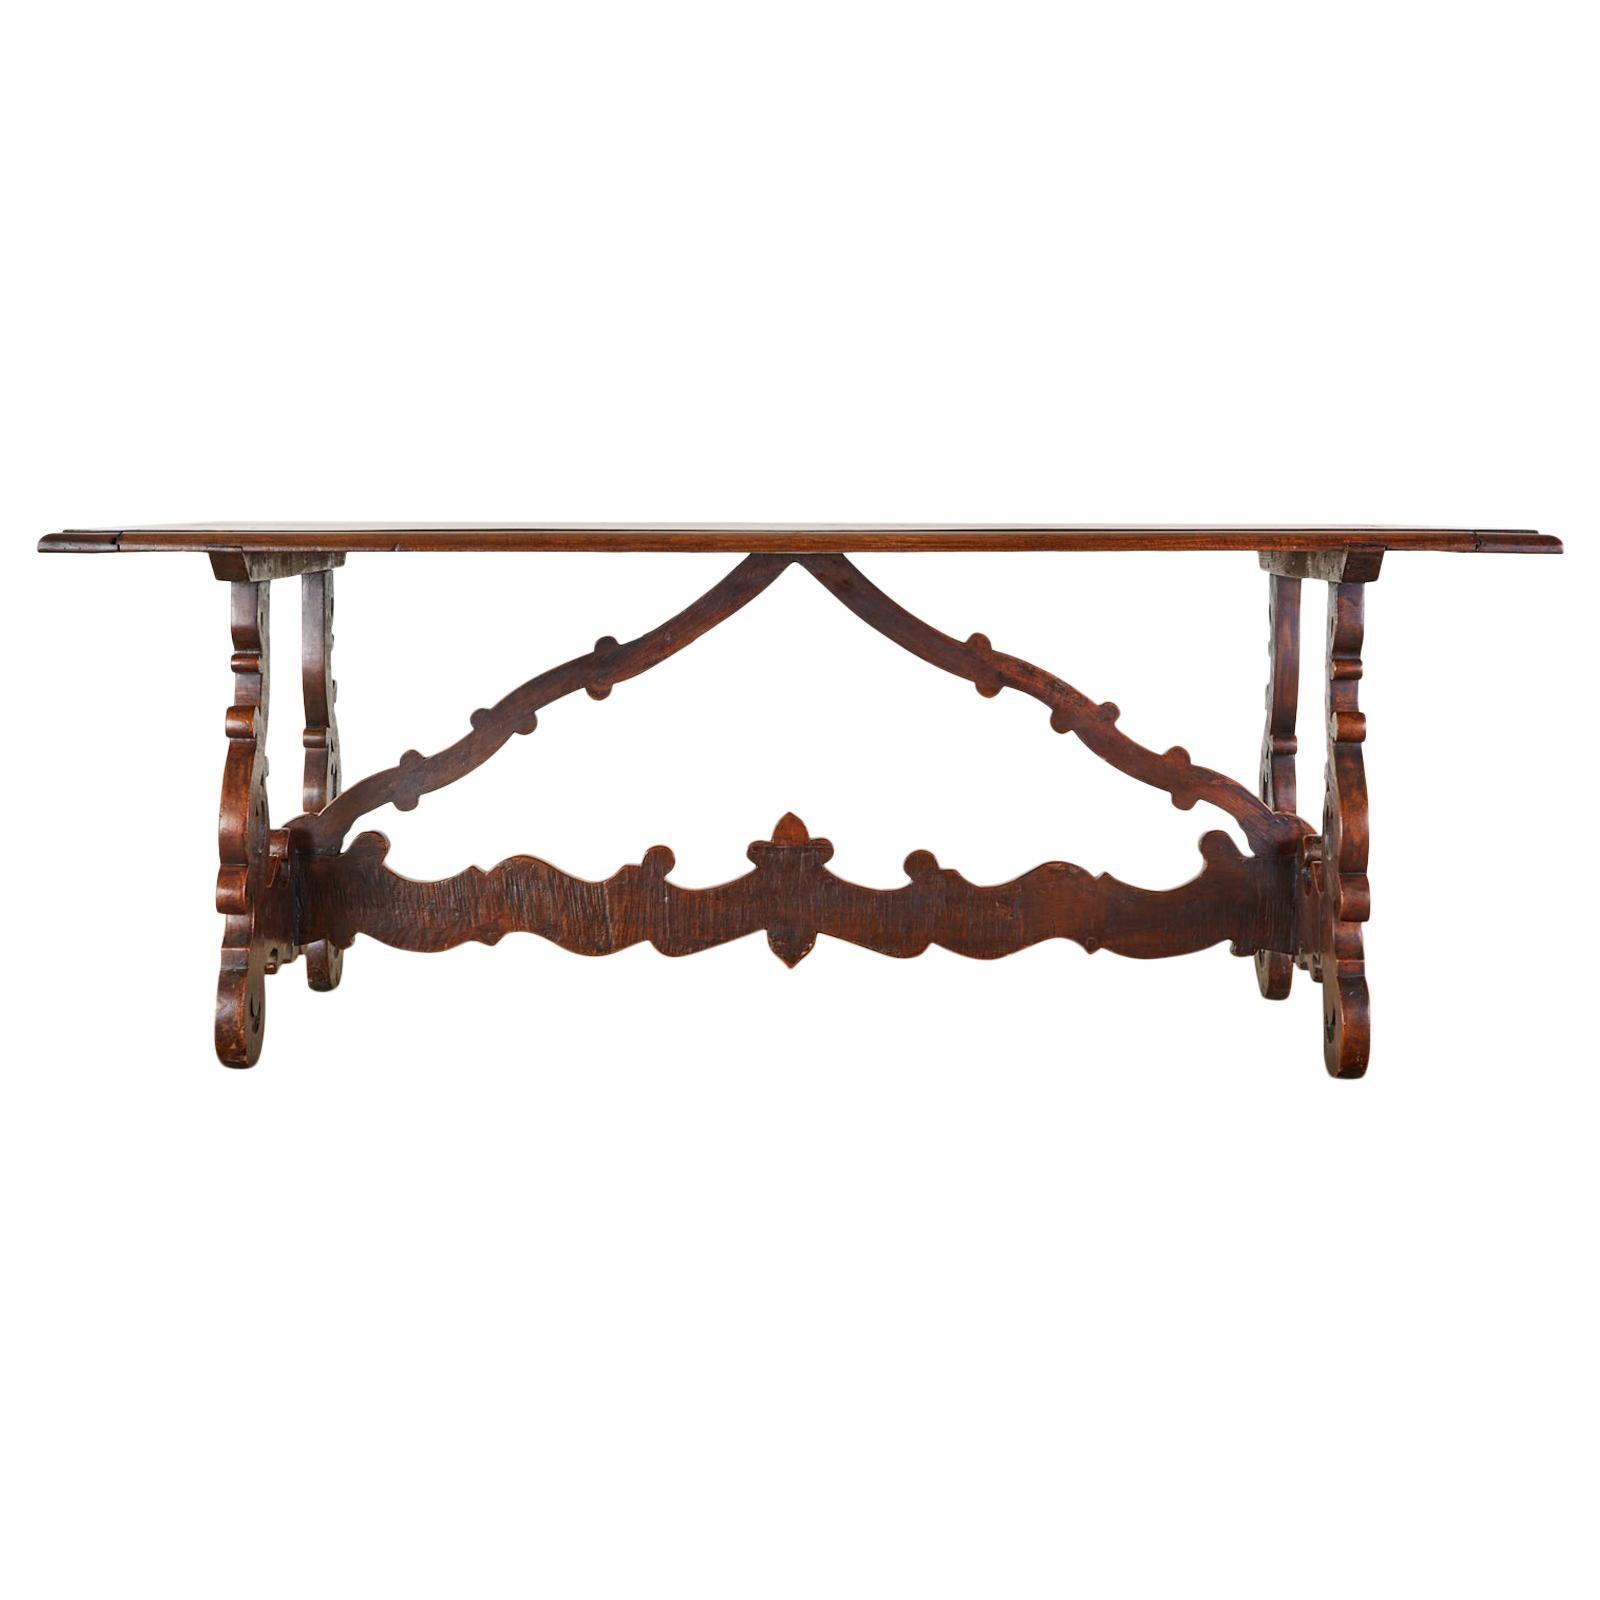 18th Century Italian Baroque Walnut Trestle Dining Table